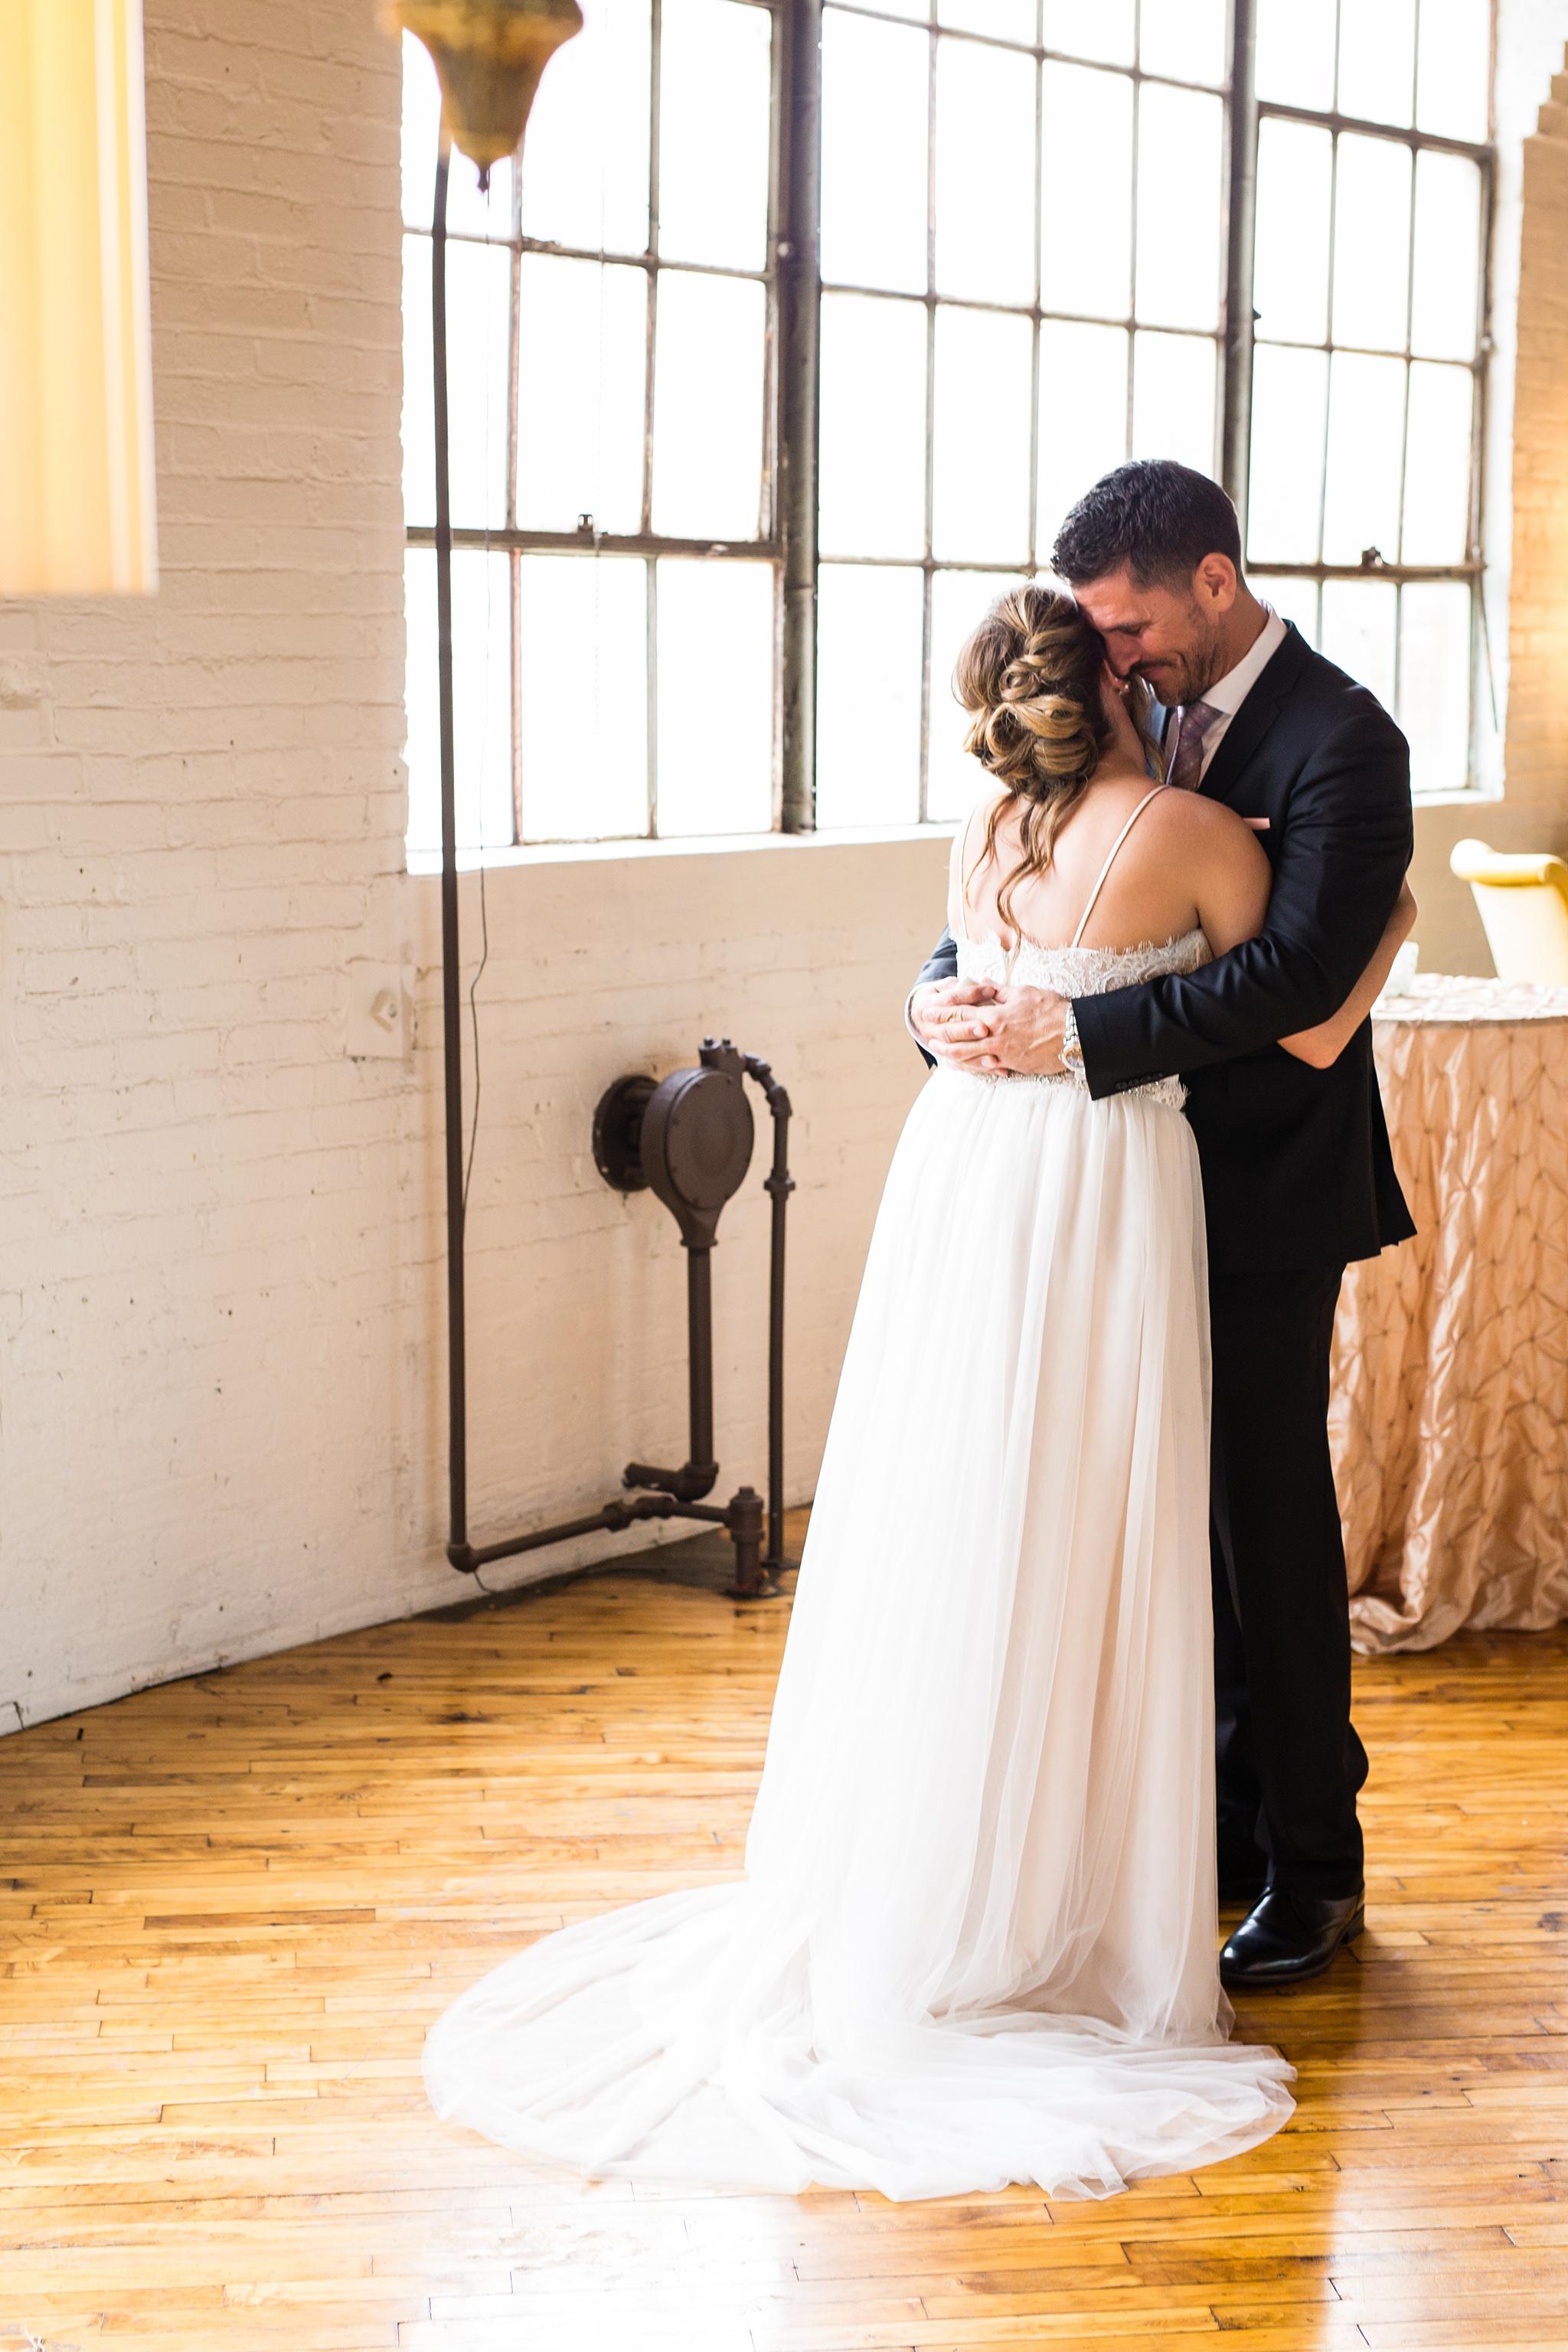 Meghan_Drew_Grand_Rapids_Cheney_place_Wedding021.JPG